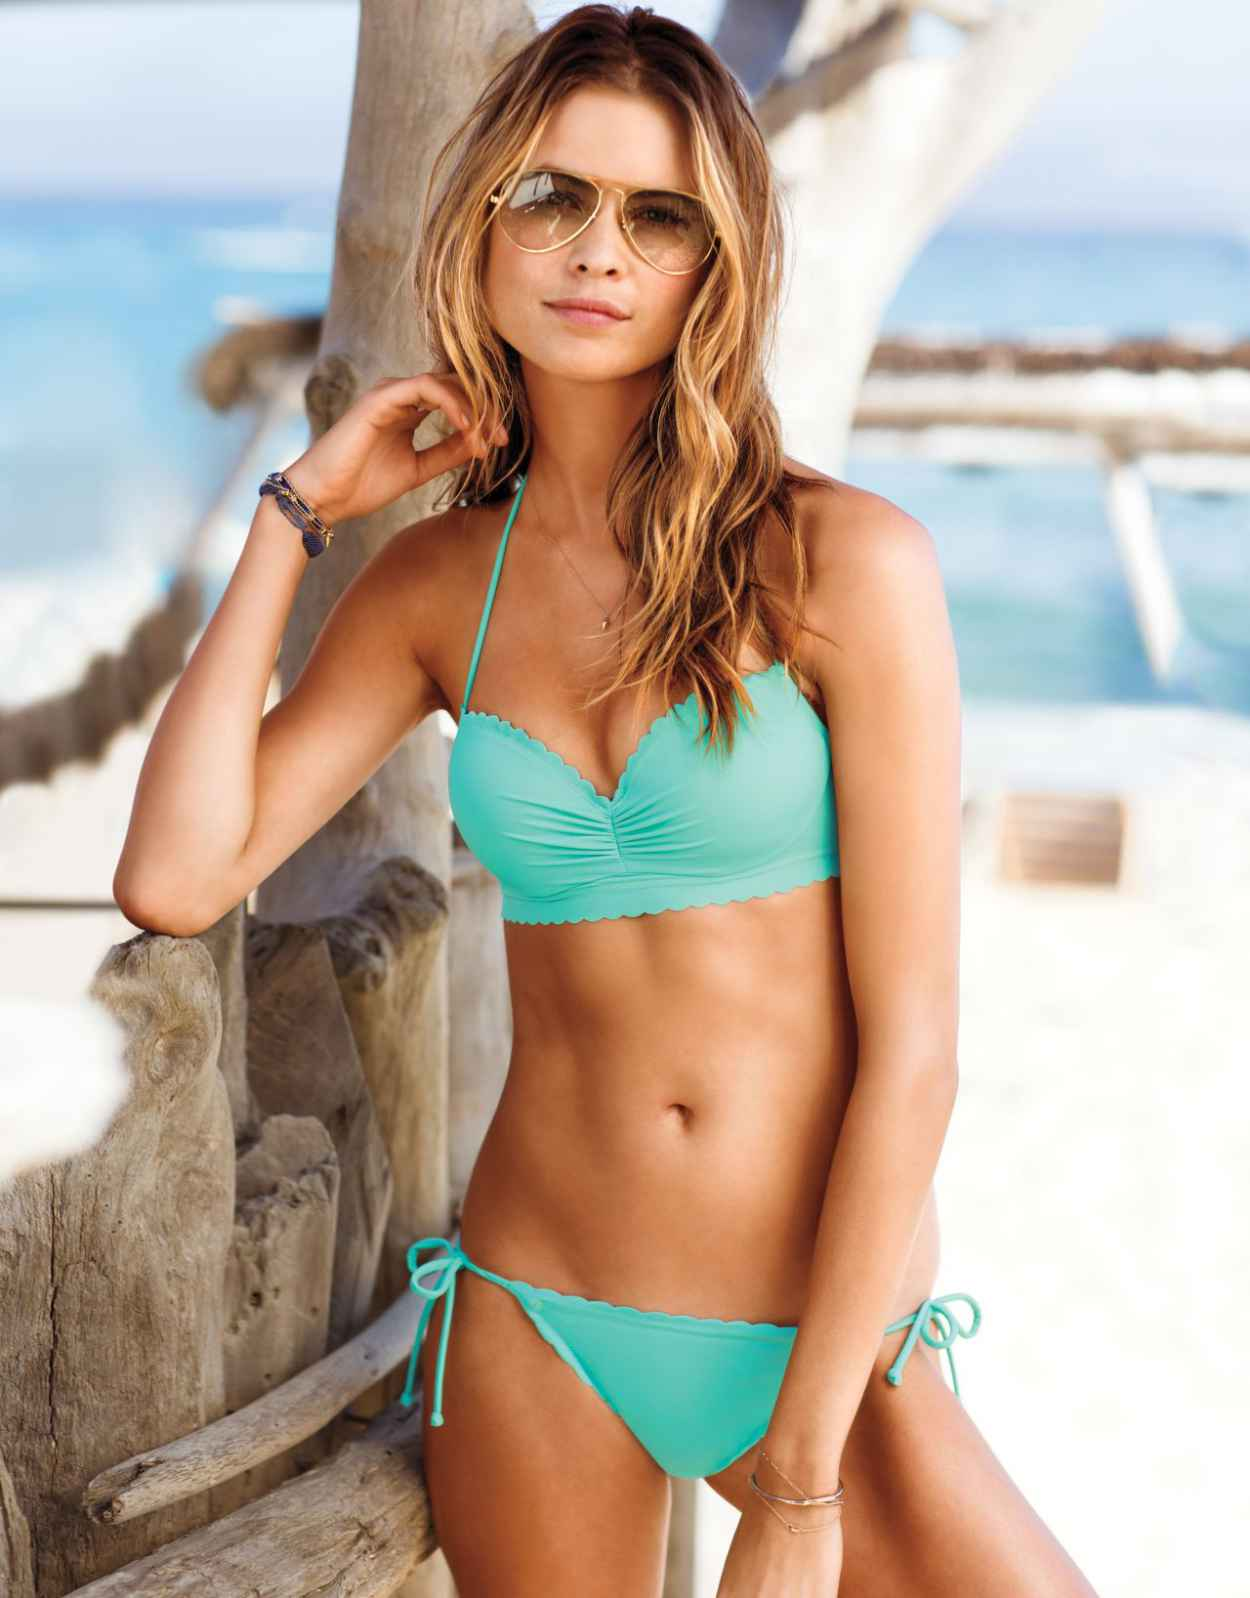 Behati Prinsloo Nikini Photos - Victorias Secret - Swim 2015 - St. Tropez-1